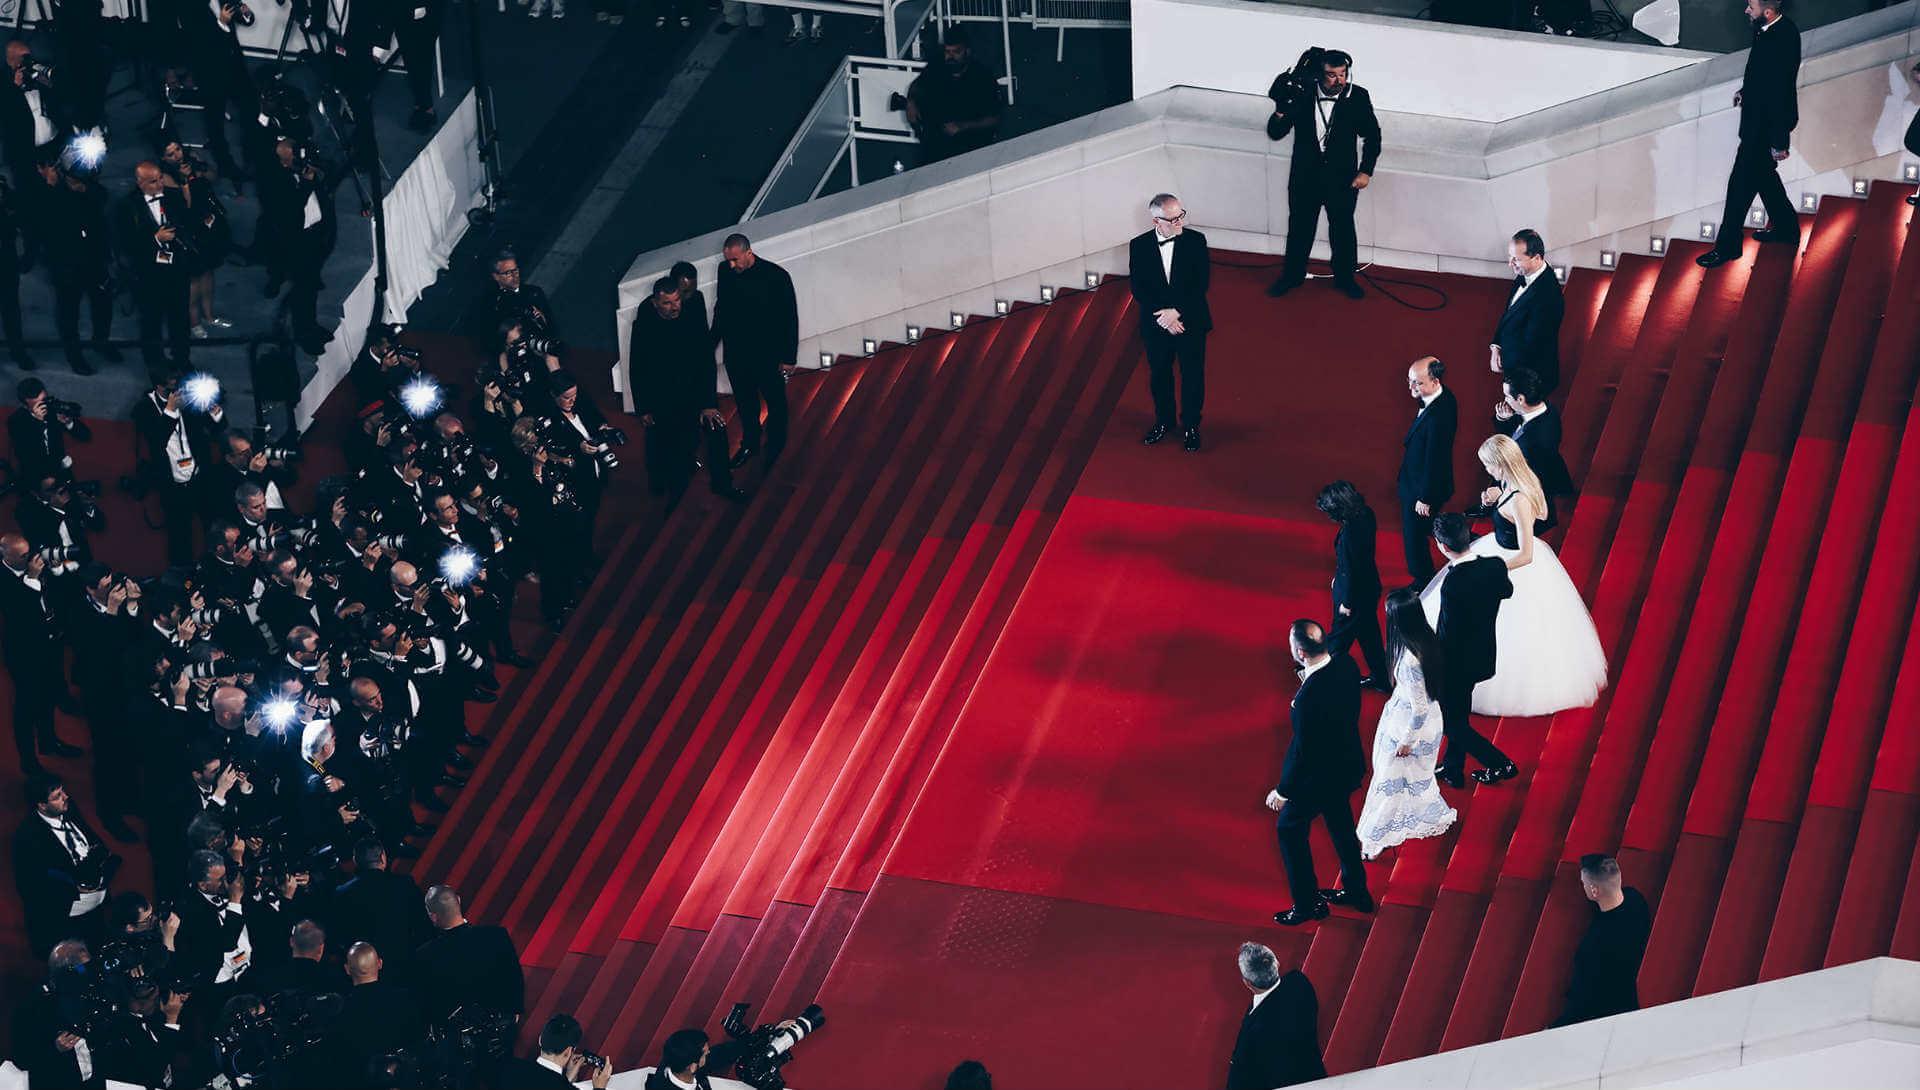 Festival de Cannes - Christophe Bouillon  - FDC.jpg